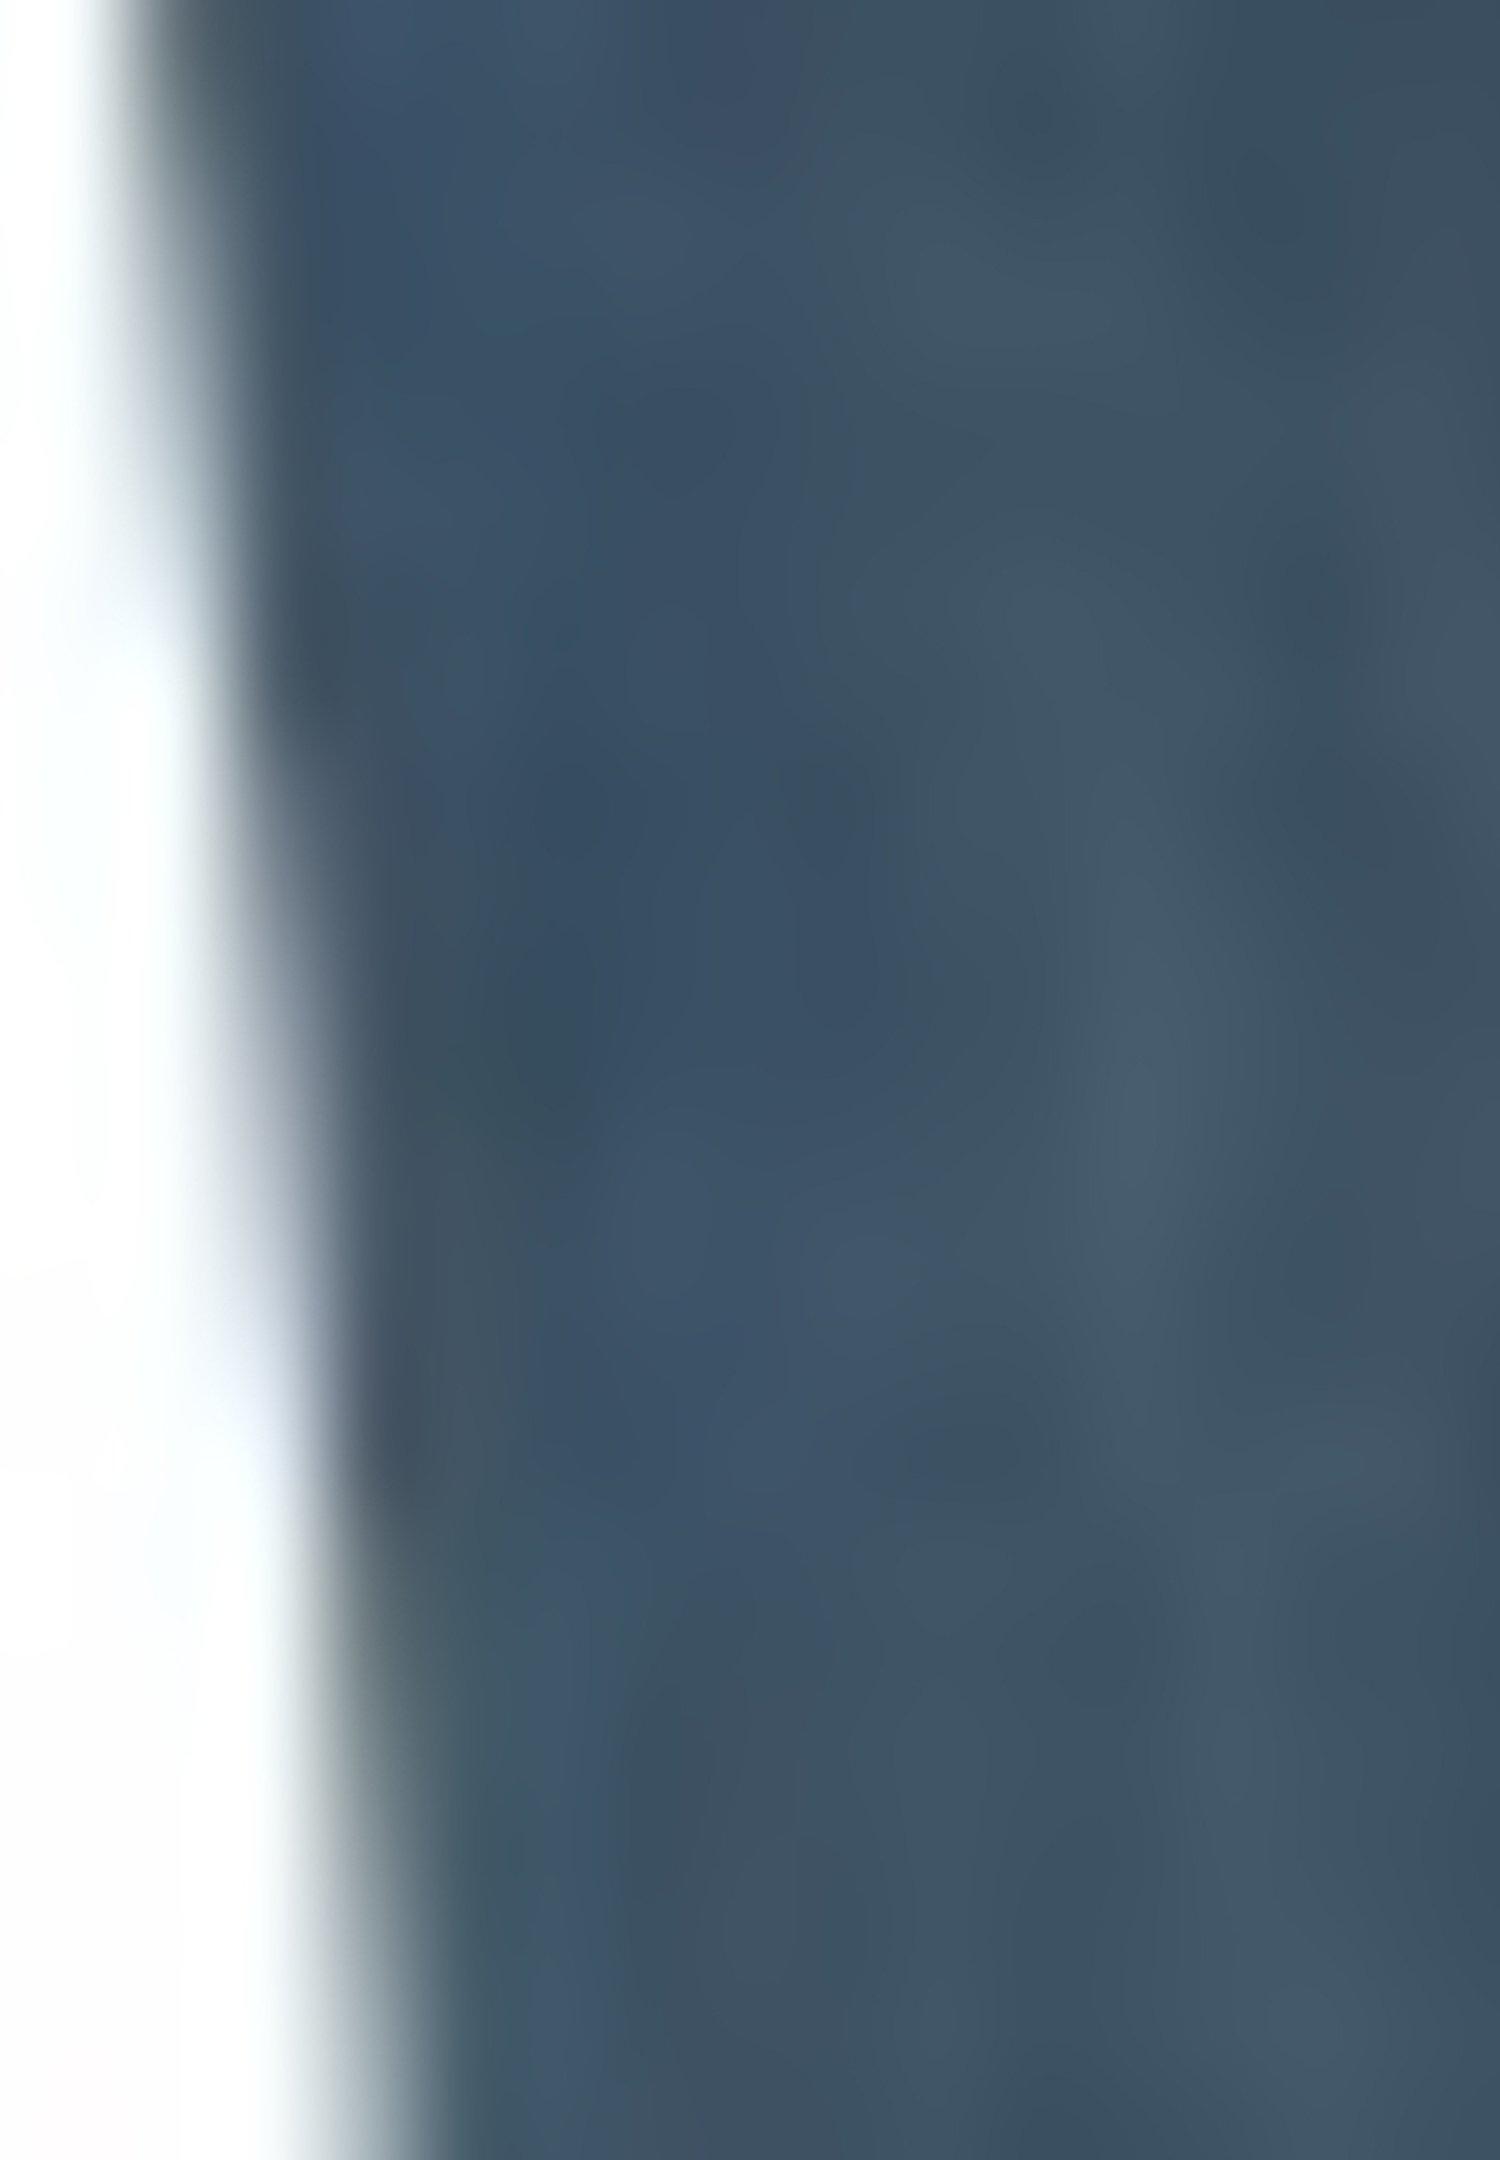 100% garanti Meilleurs prix Taifun Jean flare - blue denim - ZALANDO.FR uSV1T